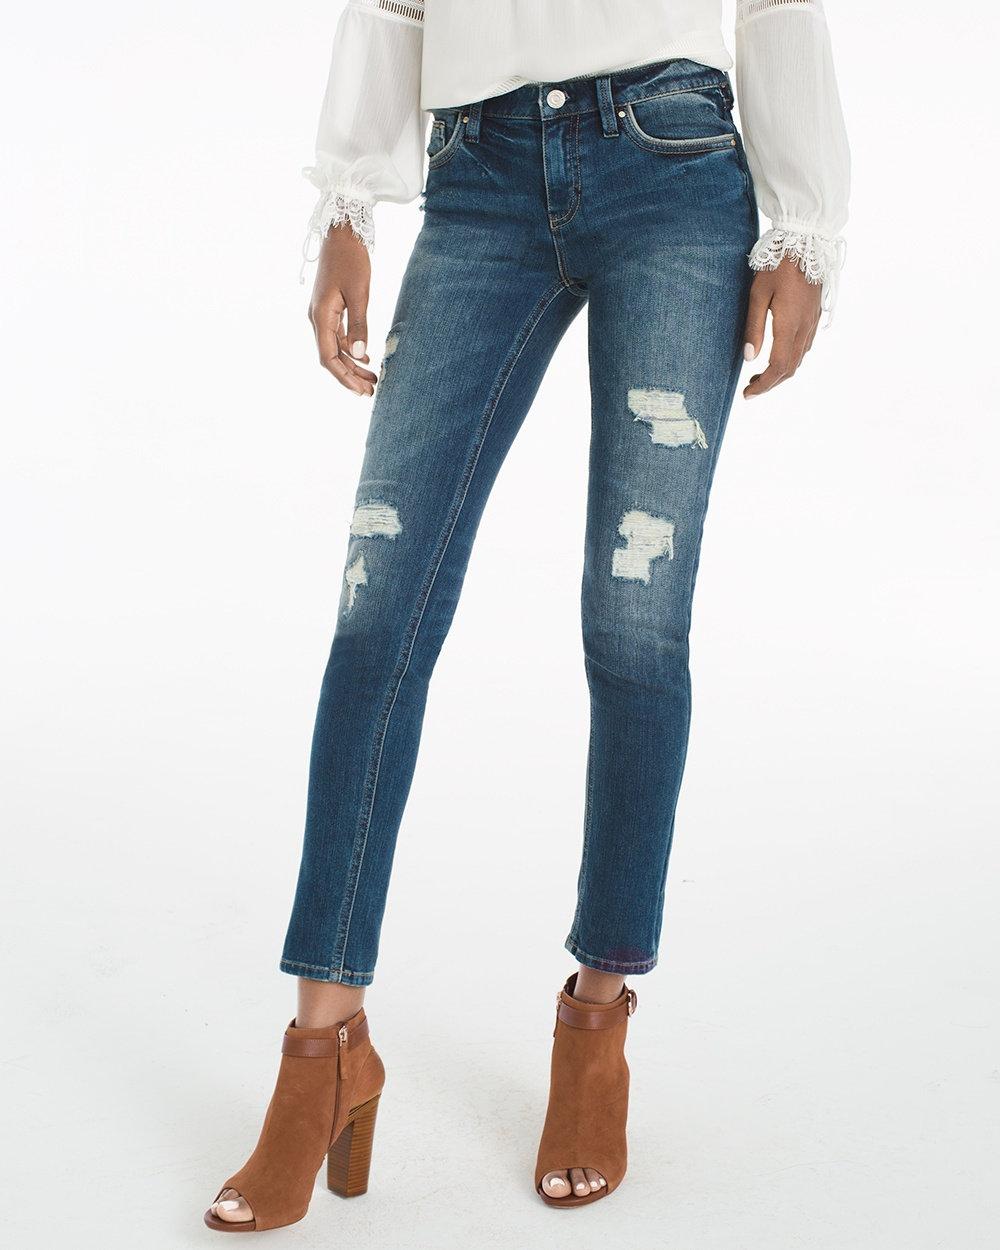 WHBM jeans 2.jpg